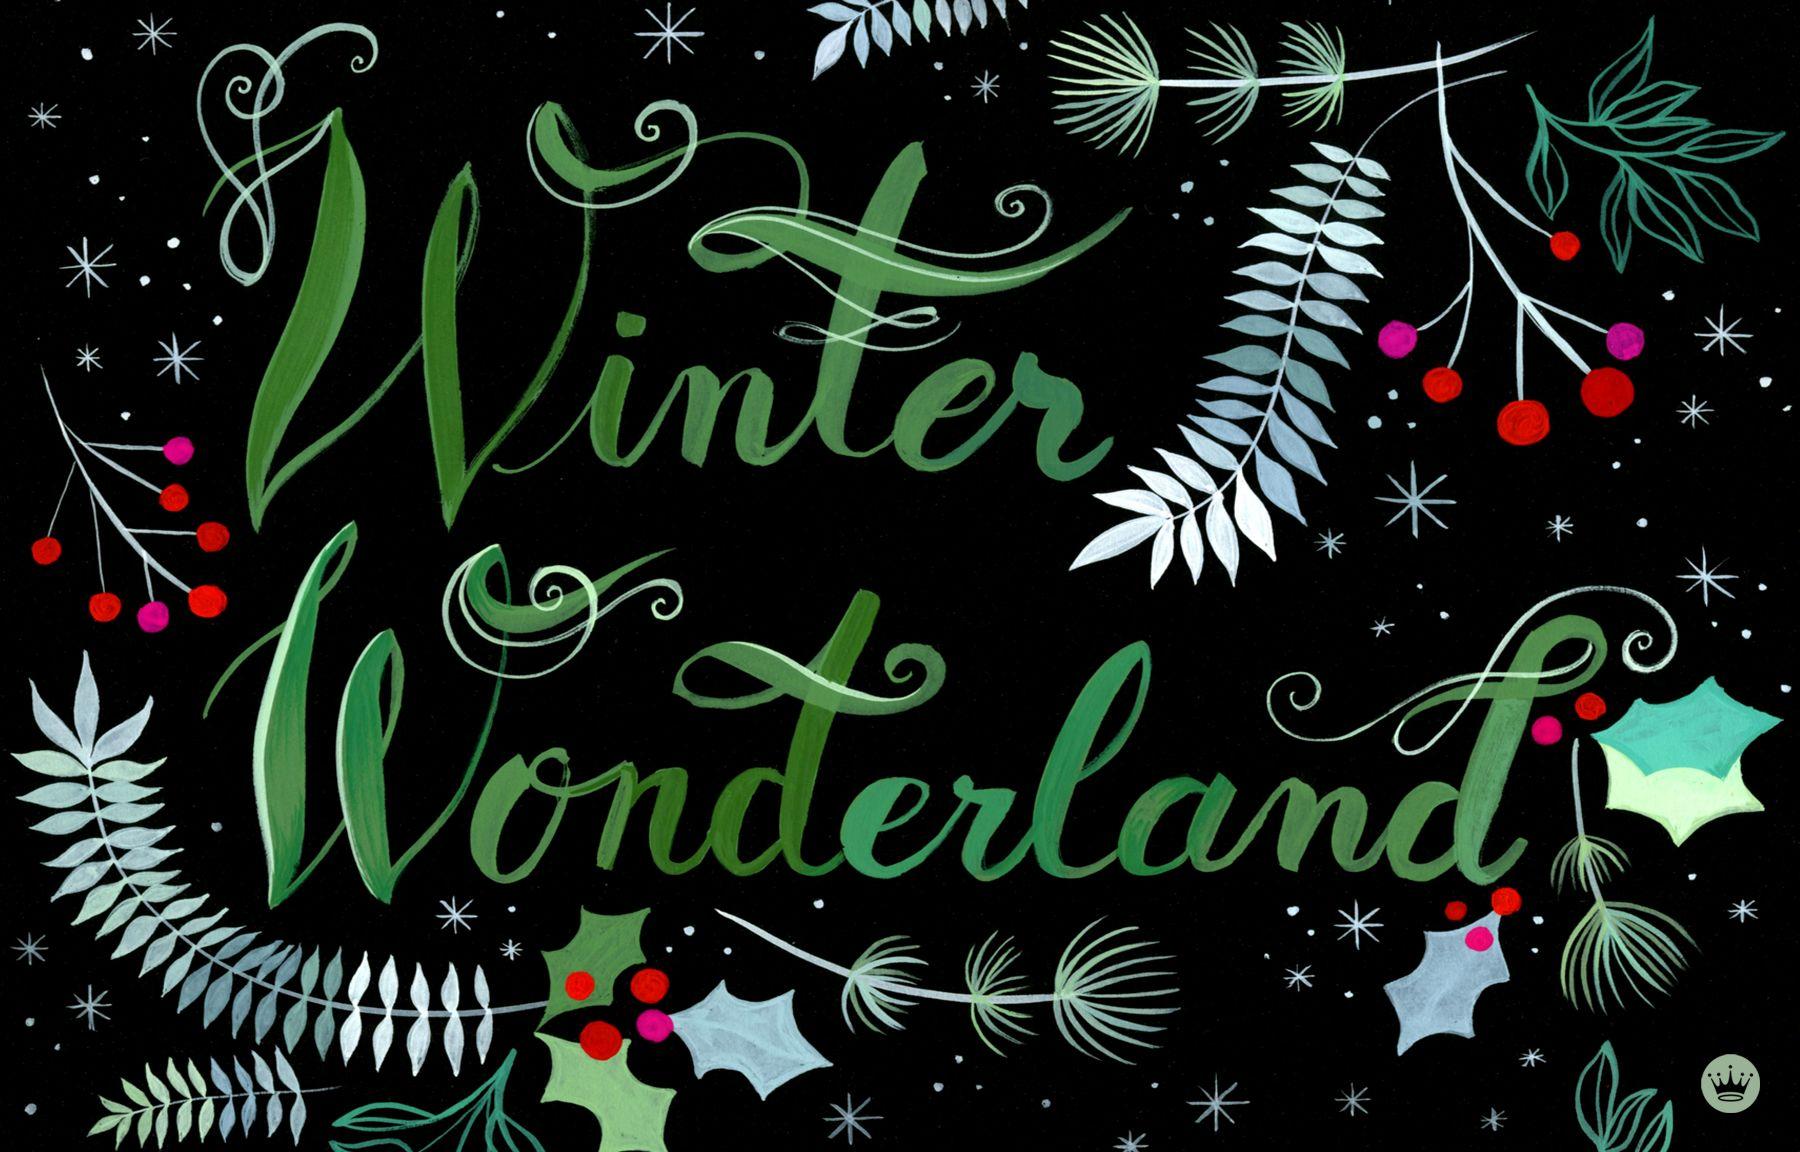 Winter Wonderland Free Holiday Wallpaper Download Hallmark Cards Thinkmakeshar Winter Wonderland Wallpaper Christmas Desktop Wallpaper Winter Wallpaper Desktop